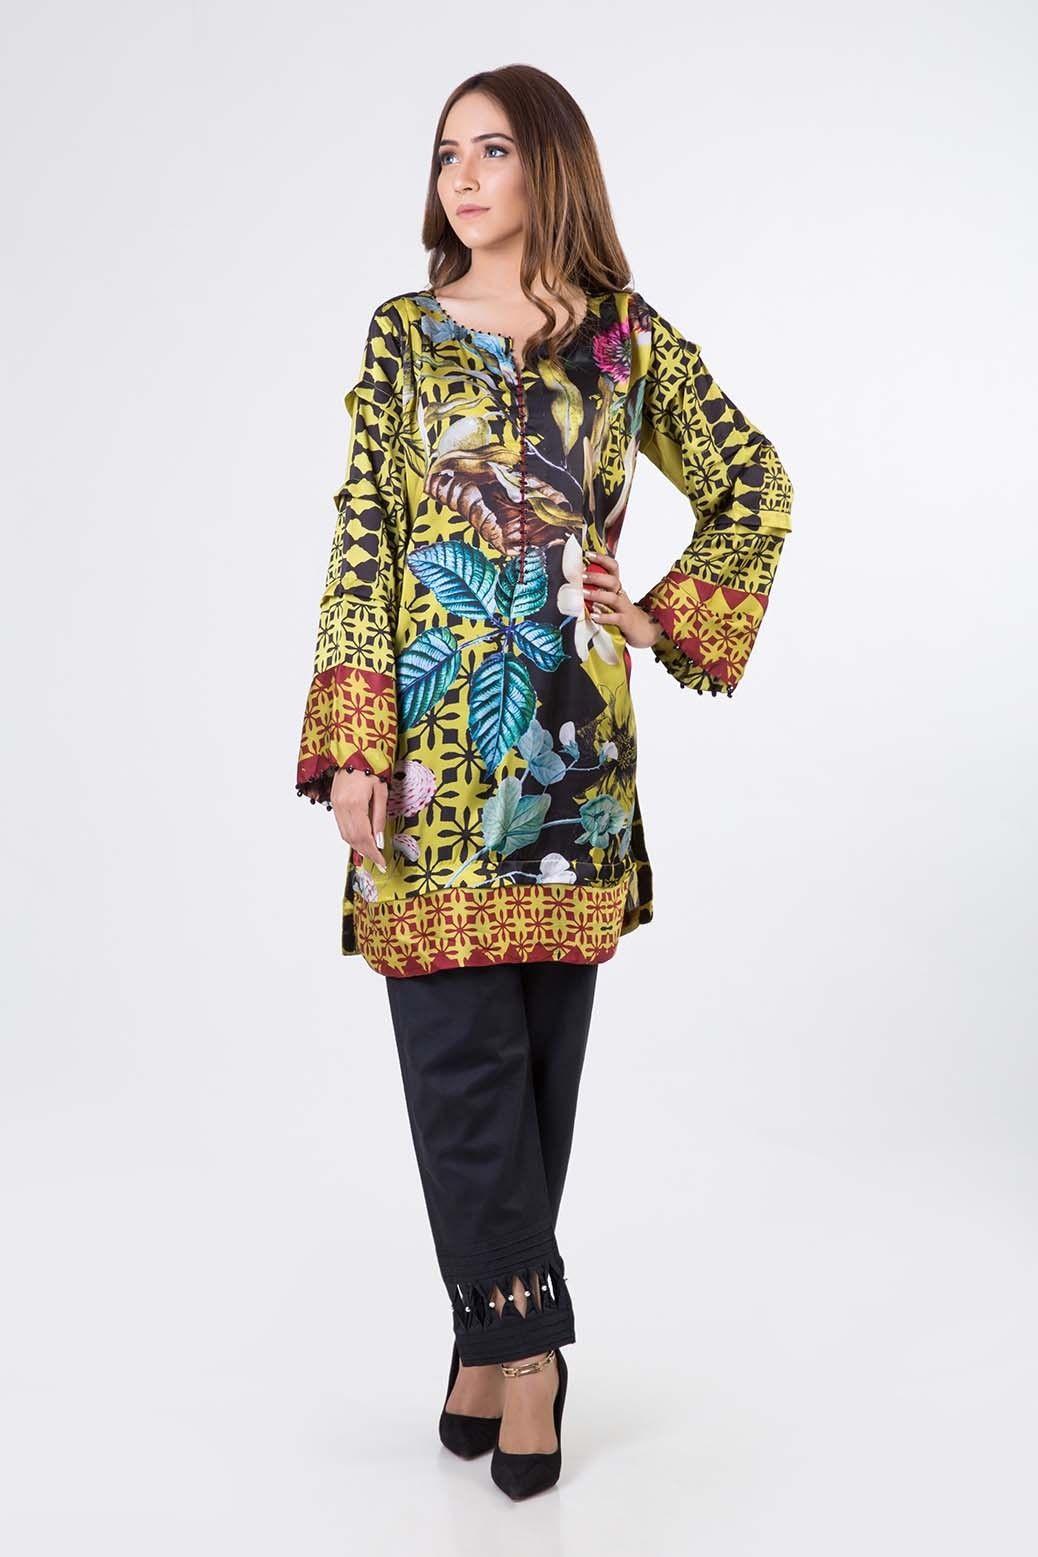 Bonanza Satrangi Eid Lawn Collection